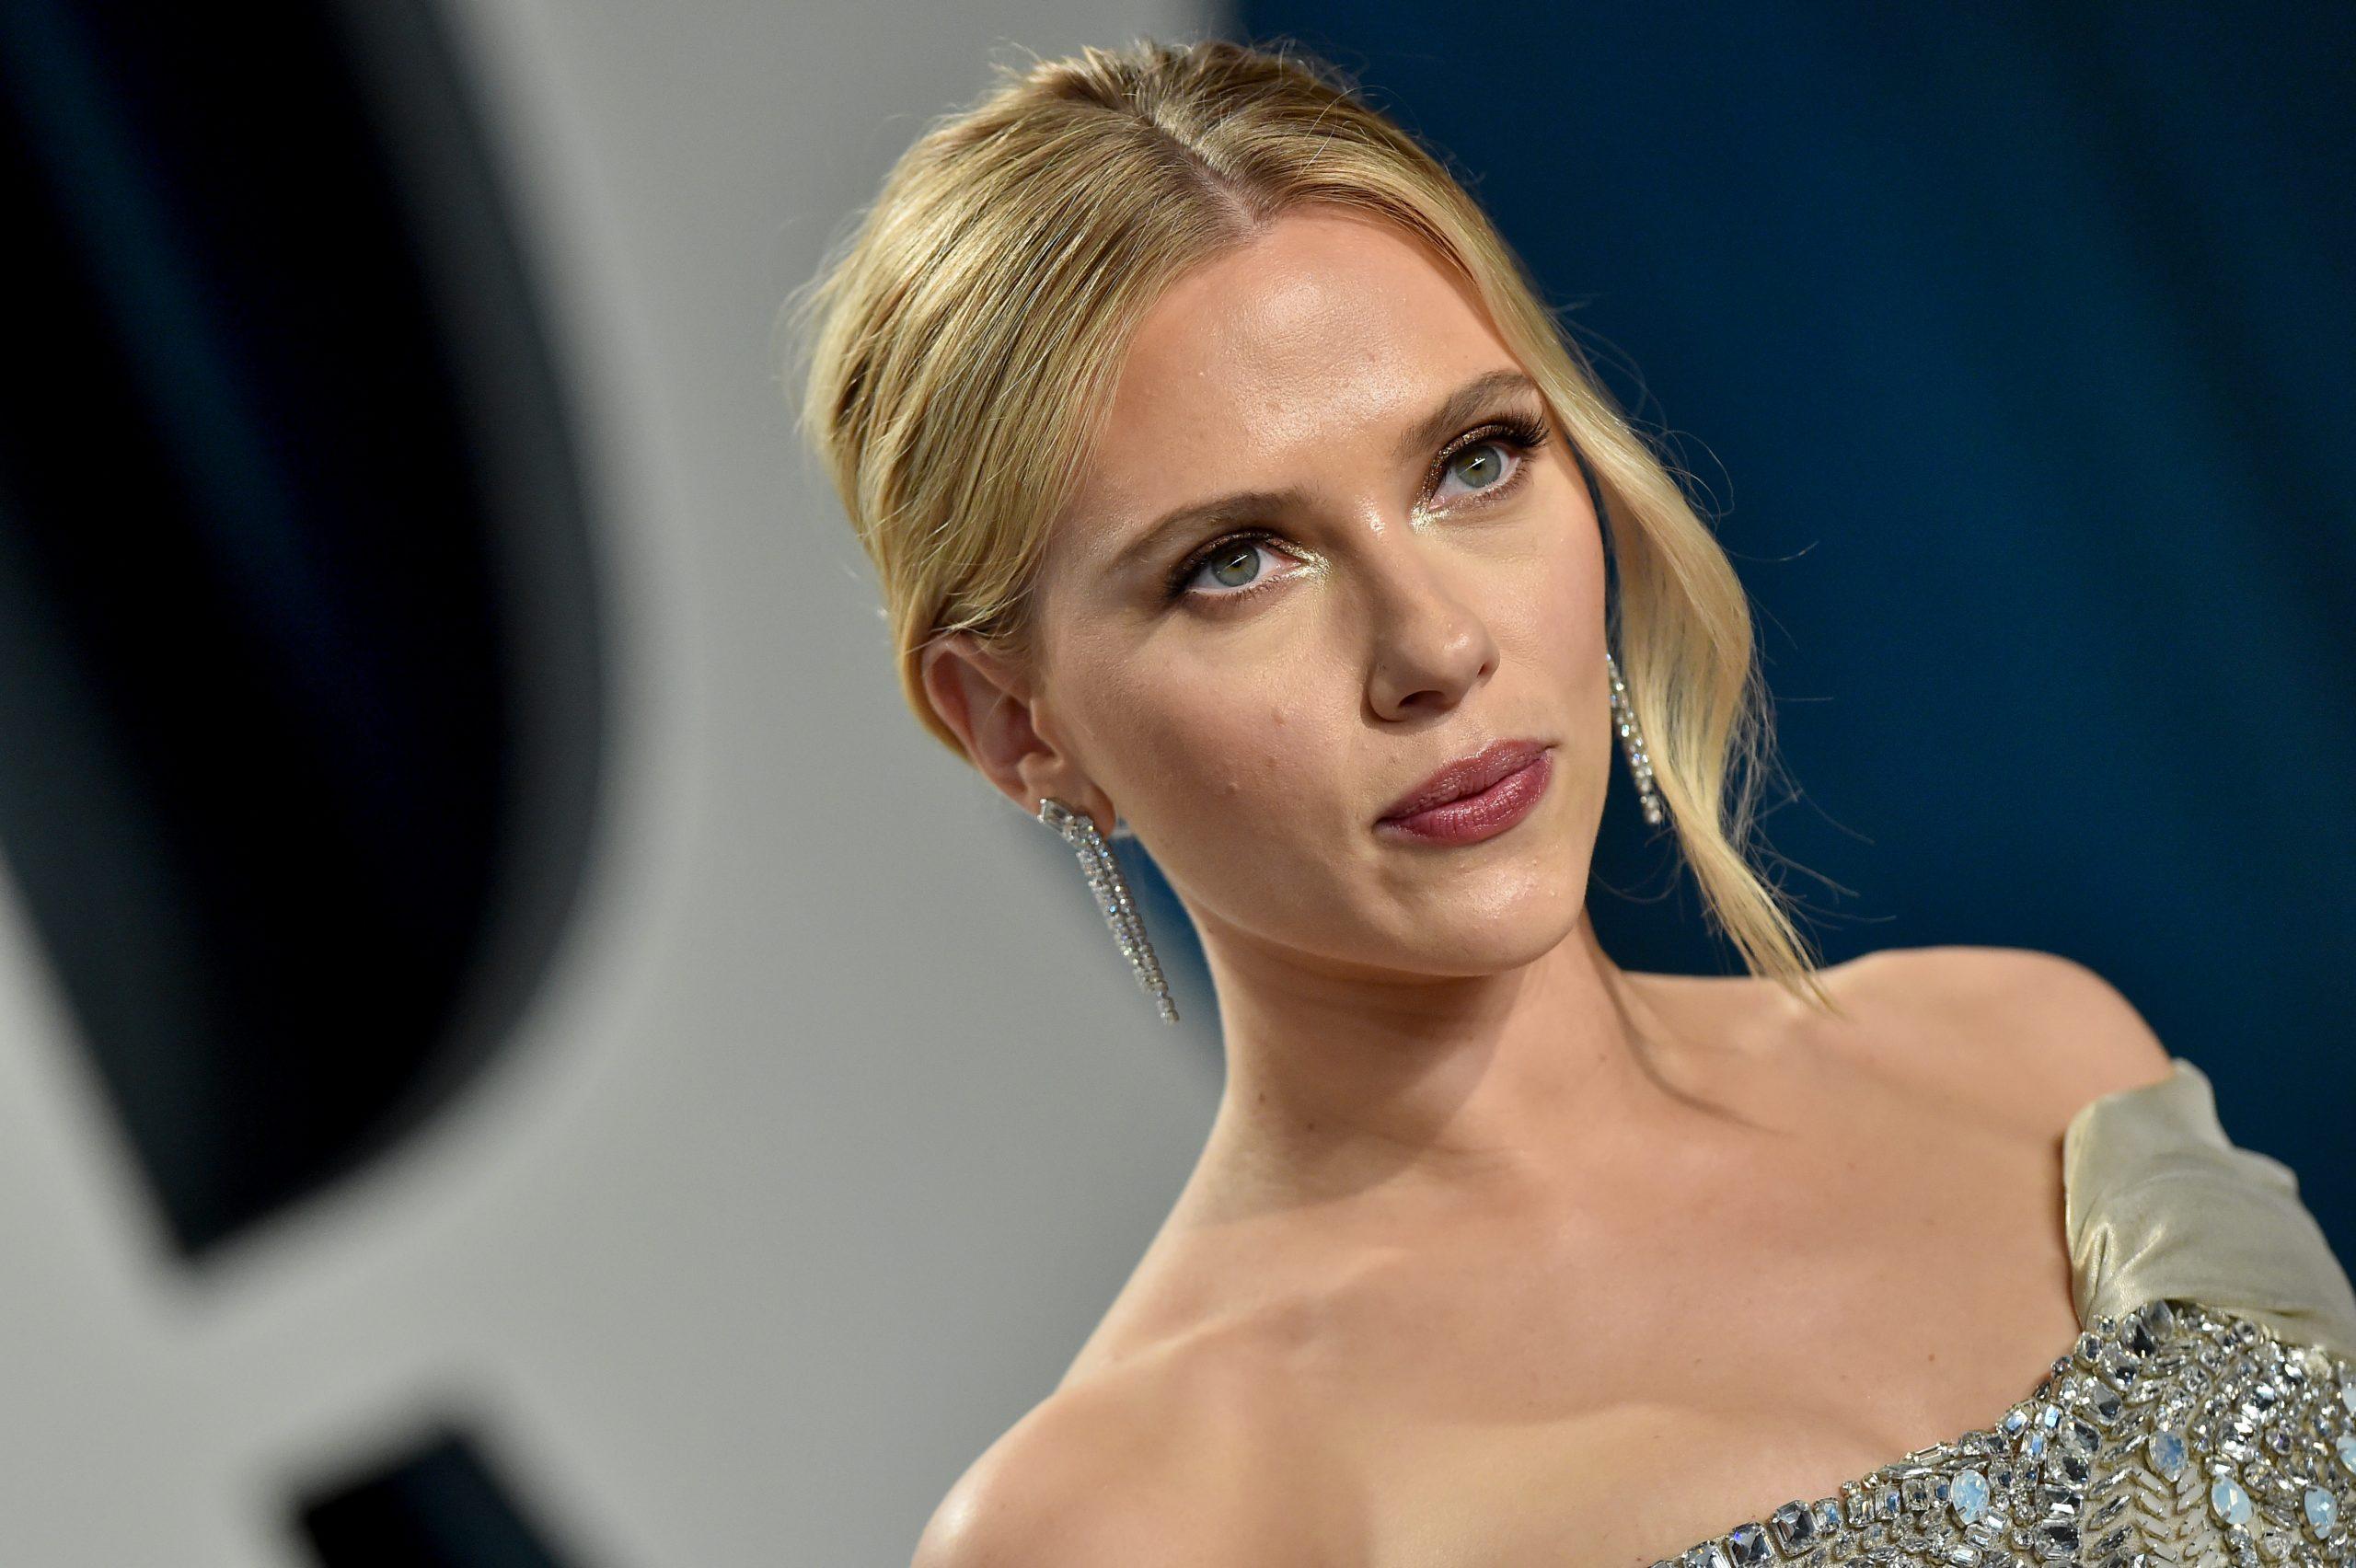 Scarlett Johansson attends the 2020 Vanity Fair Oscar Party